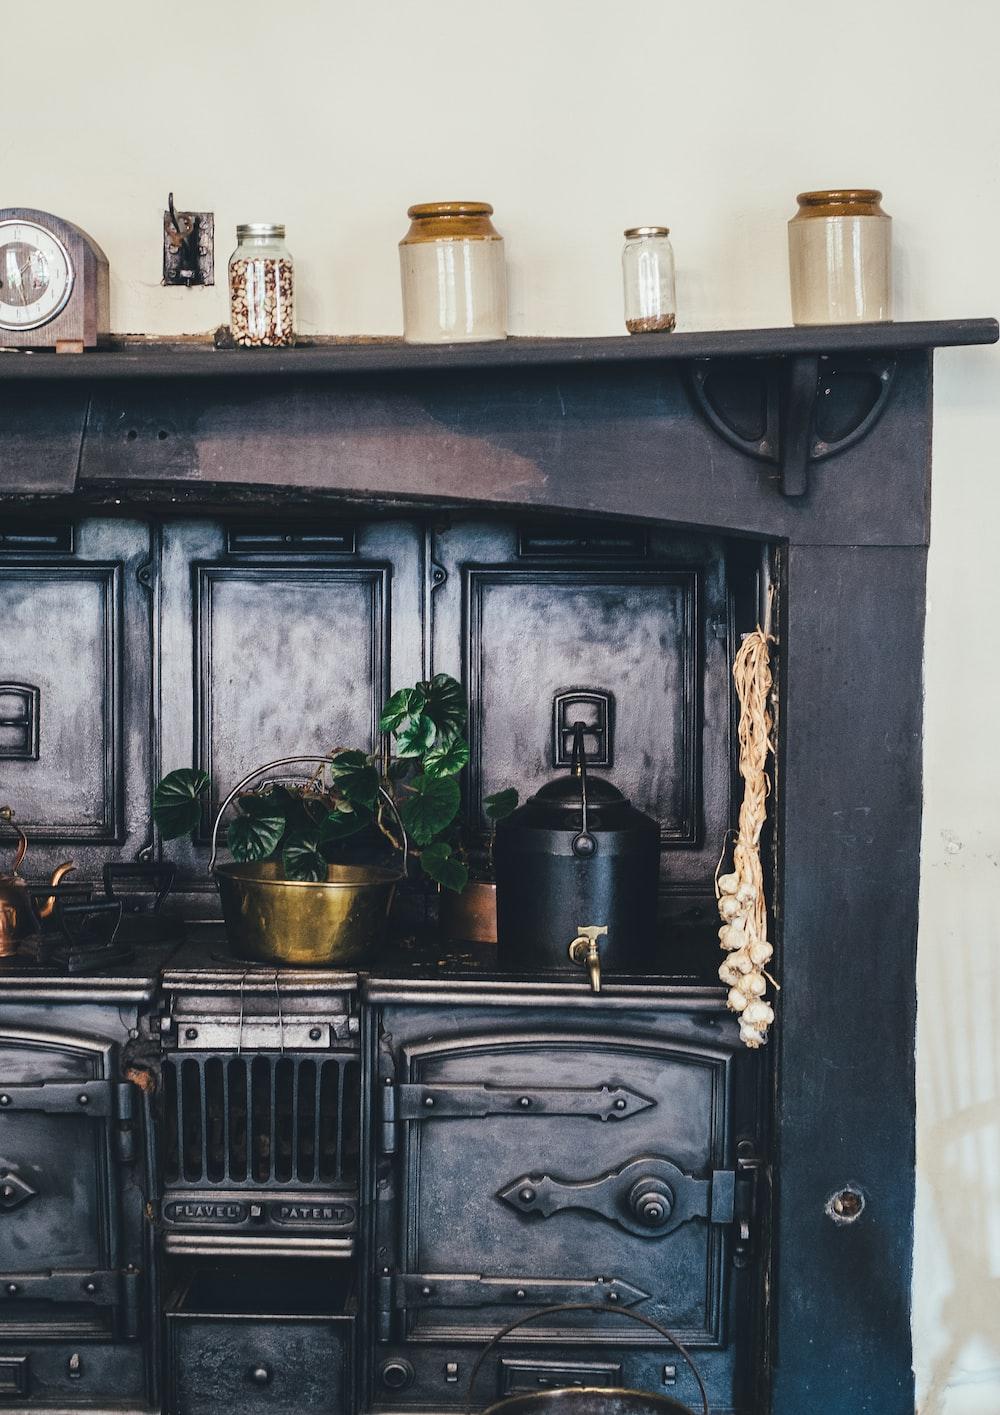 brown wooden kitchen shelf with ceramic jars on top